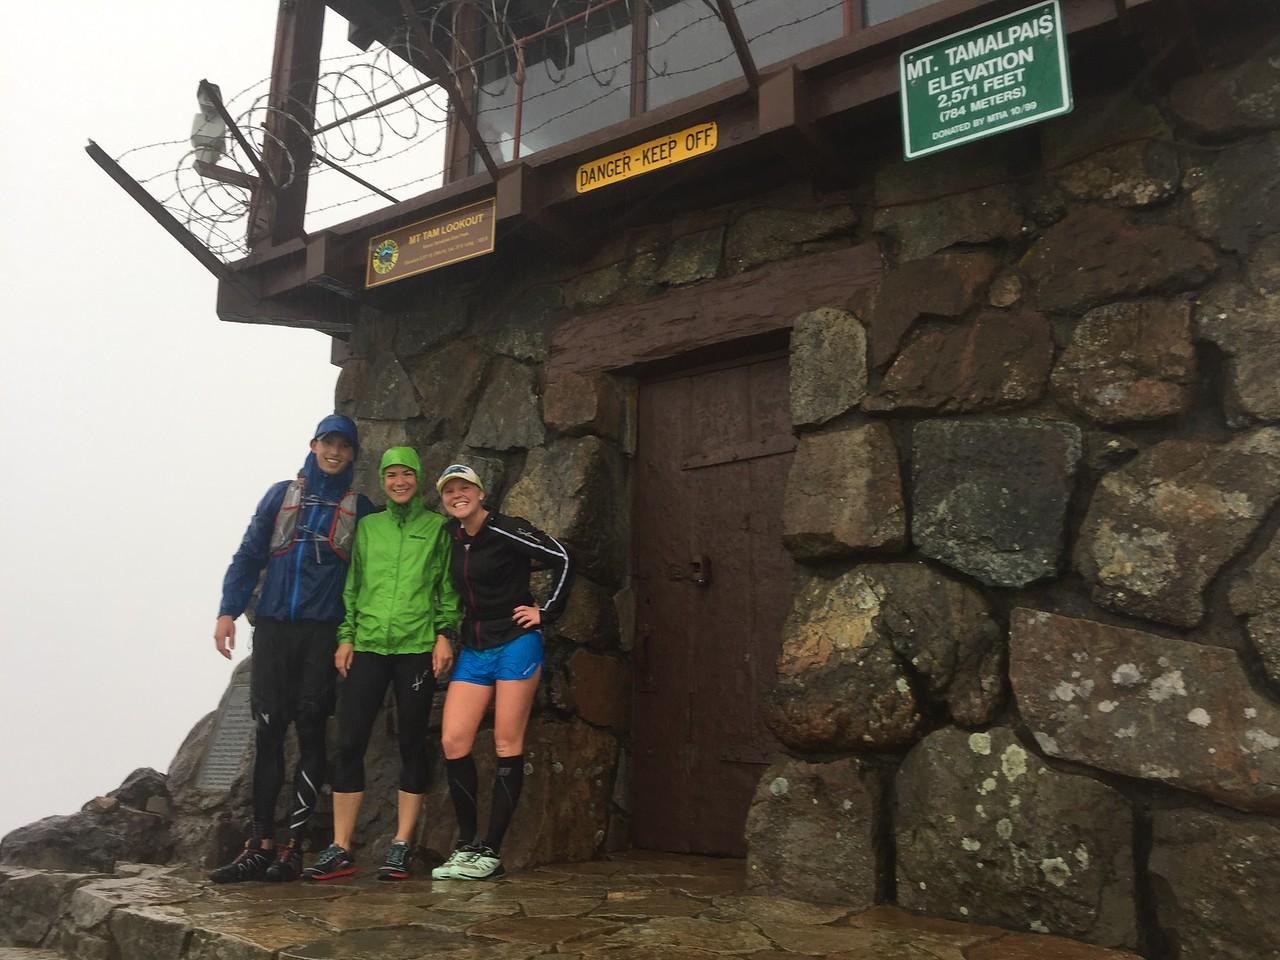 First Mt. Tam